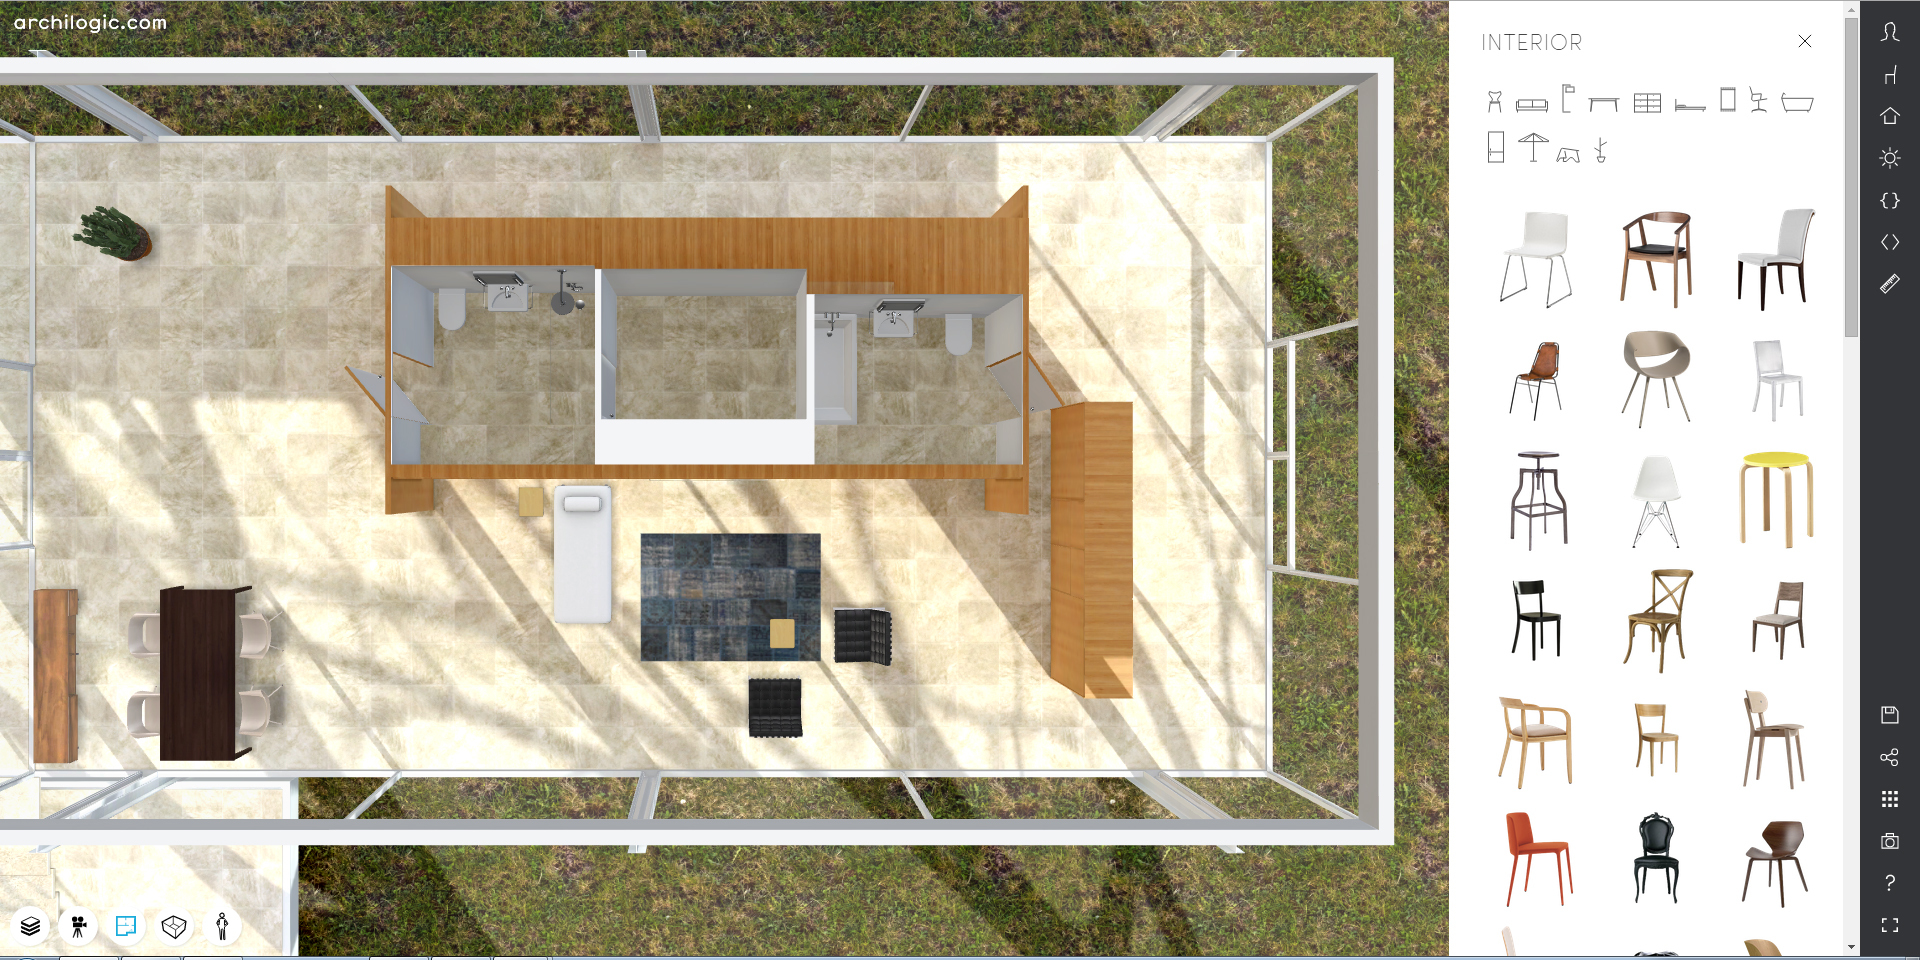 Gallery of A Virtual Look Into Mies van der Rohes